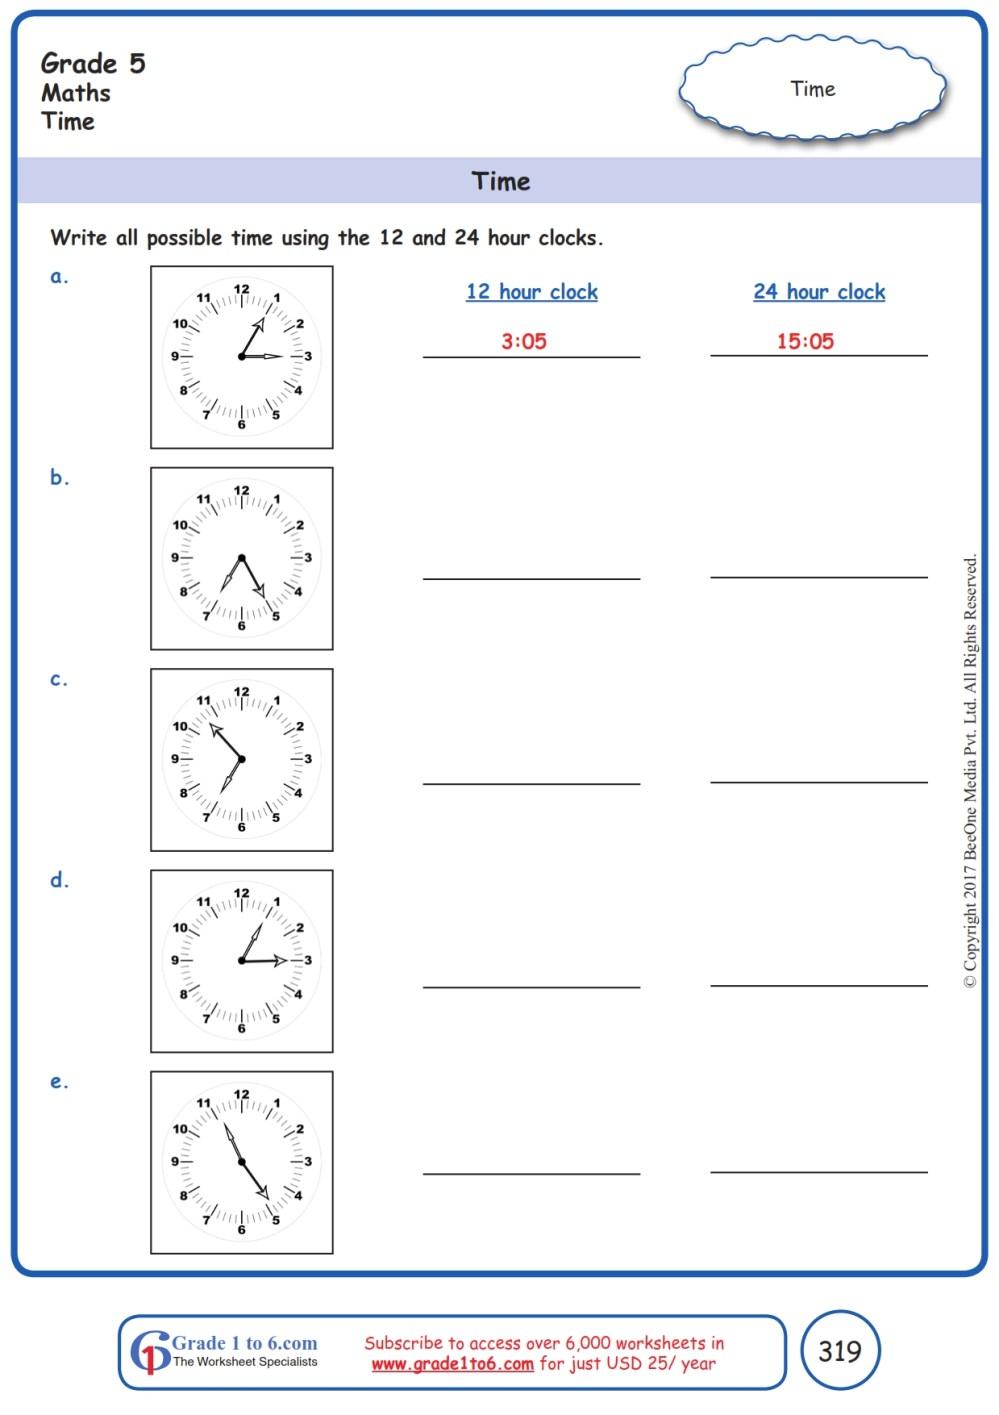 medium resolution of Time  12 hr \u0026 24 hr  Worksheets www.grade1to6.com